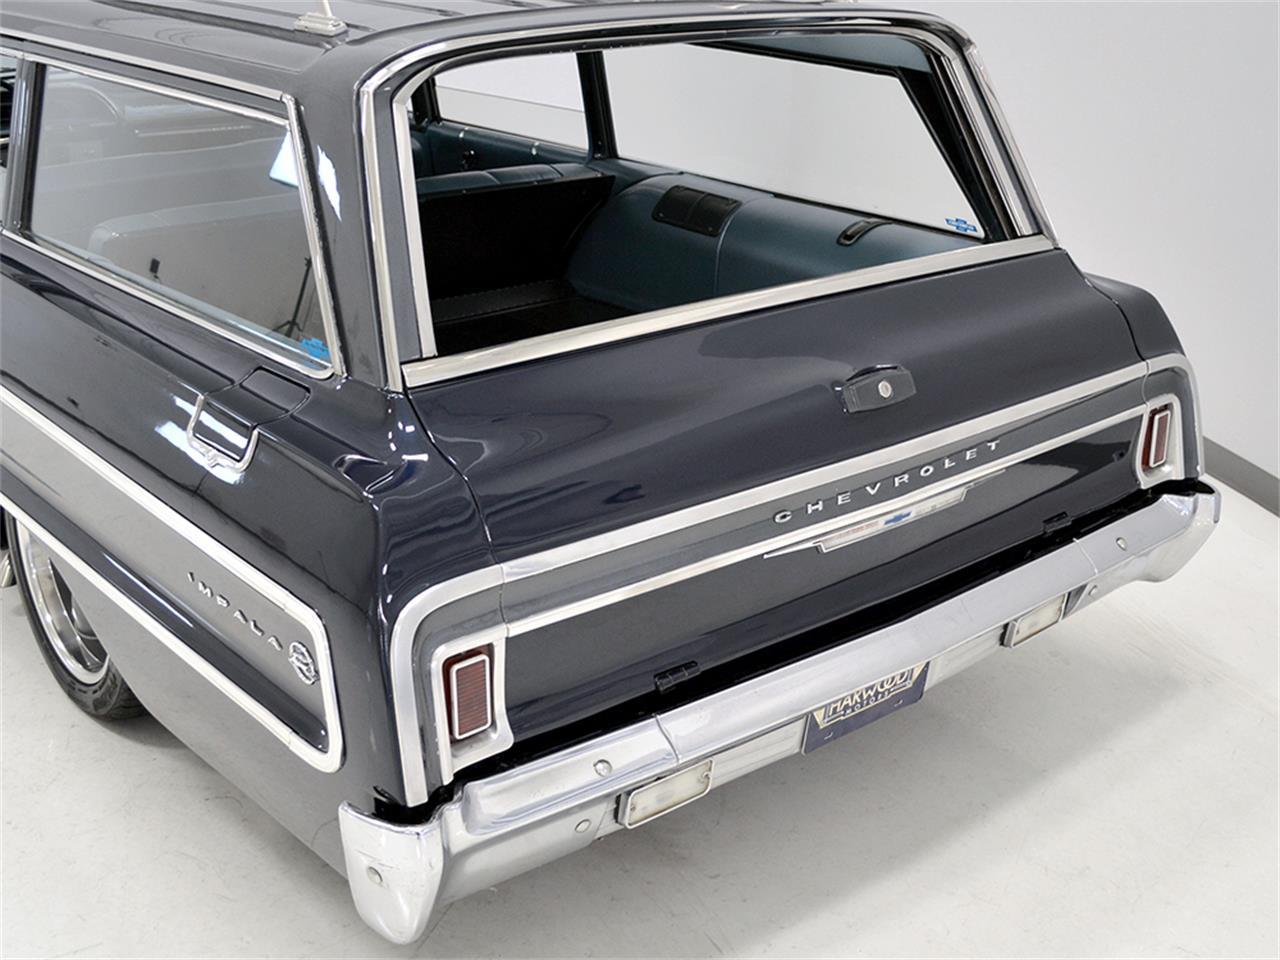 Large Picture of 1964 Impala located in Macedonia Ohio - $22,900.00 - LEX8